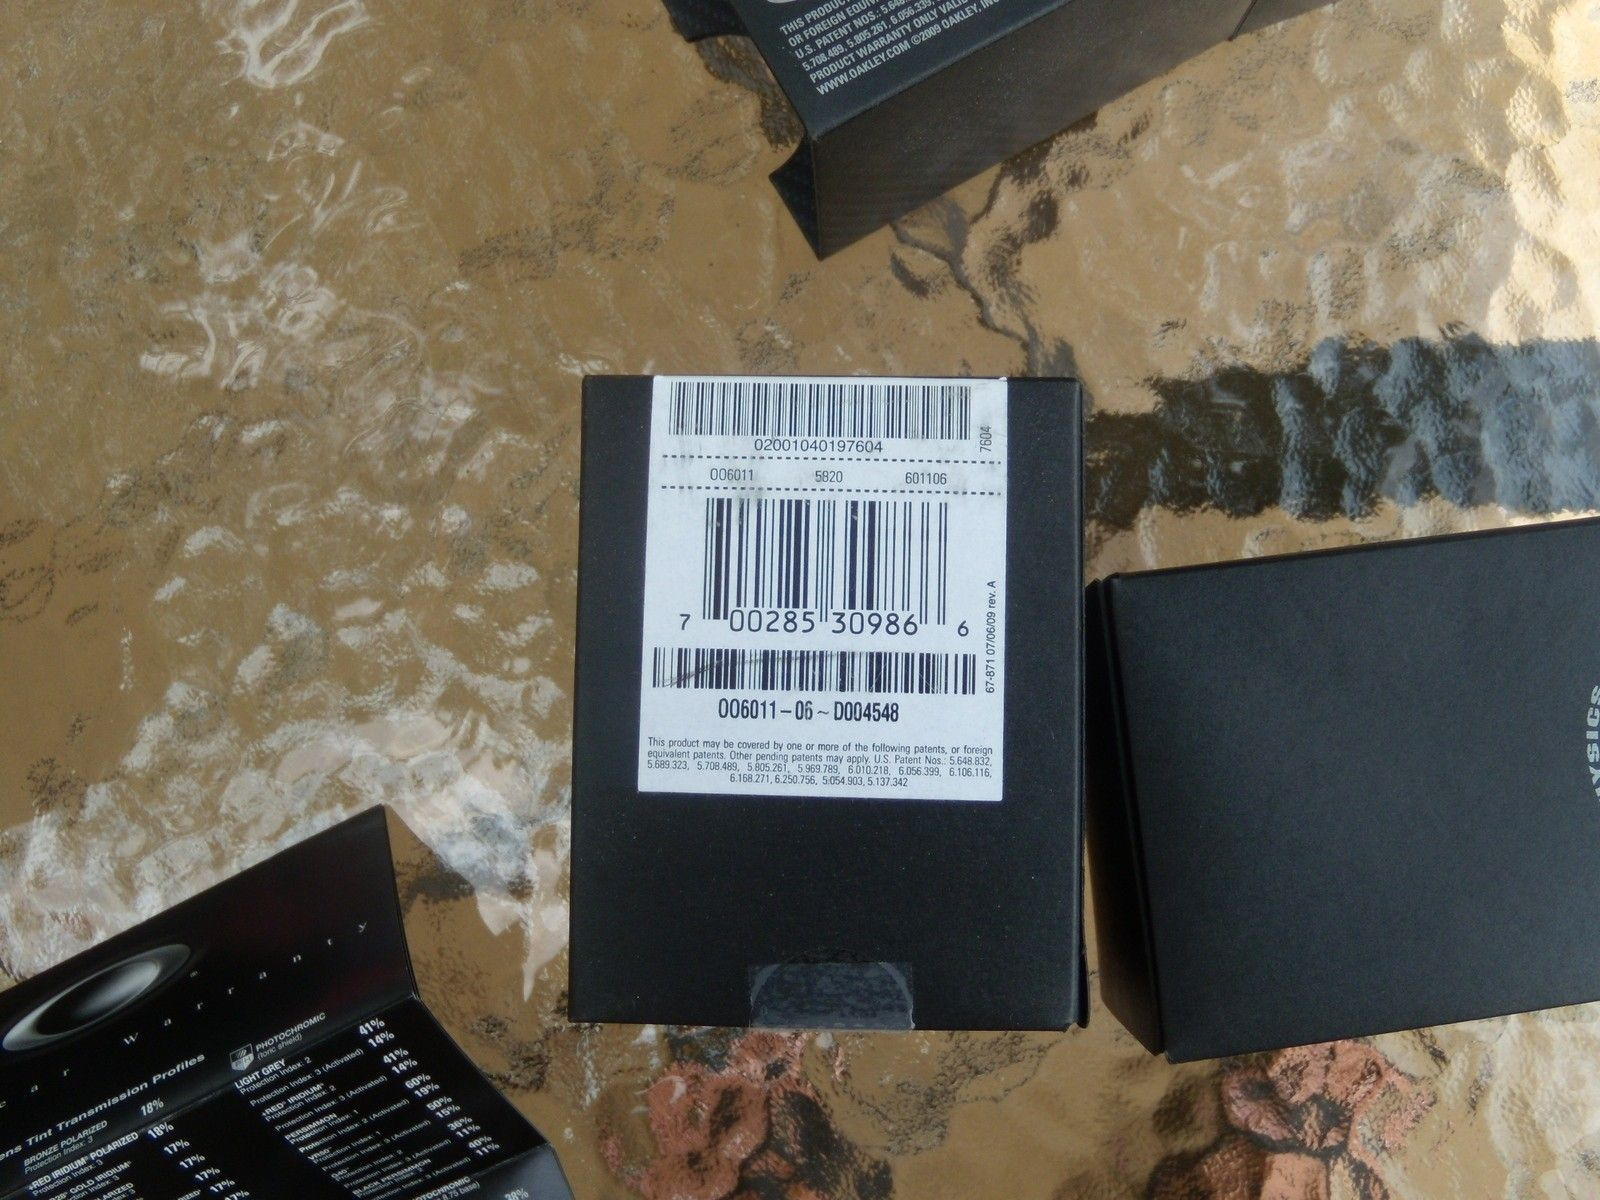 XX Squared Polished Carbon w/ Black Iridium Polarized lenses mint condition $450 obo - DSCN5991.JPG